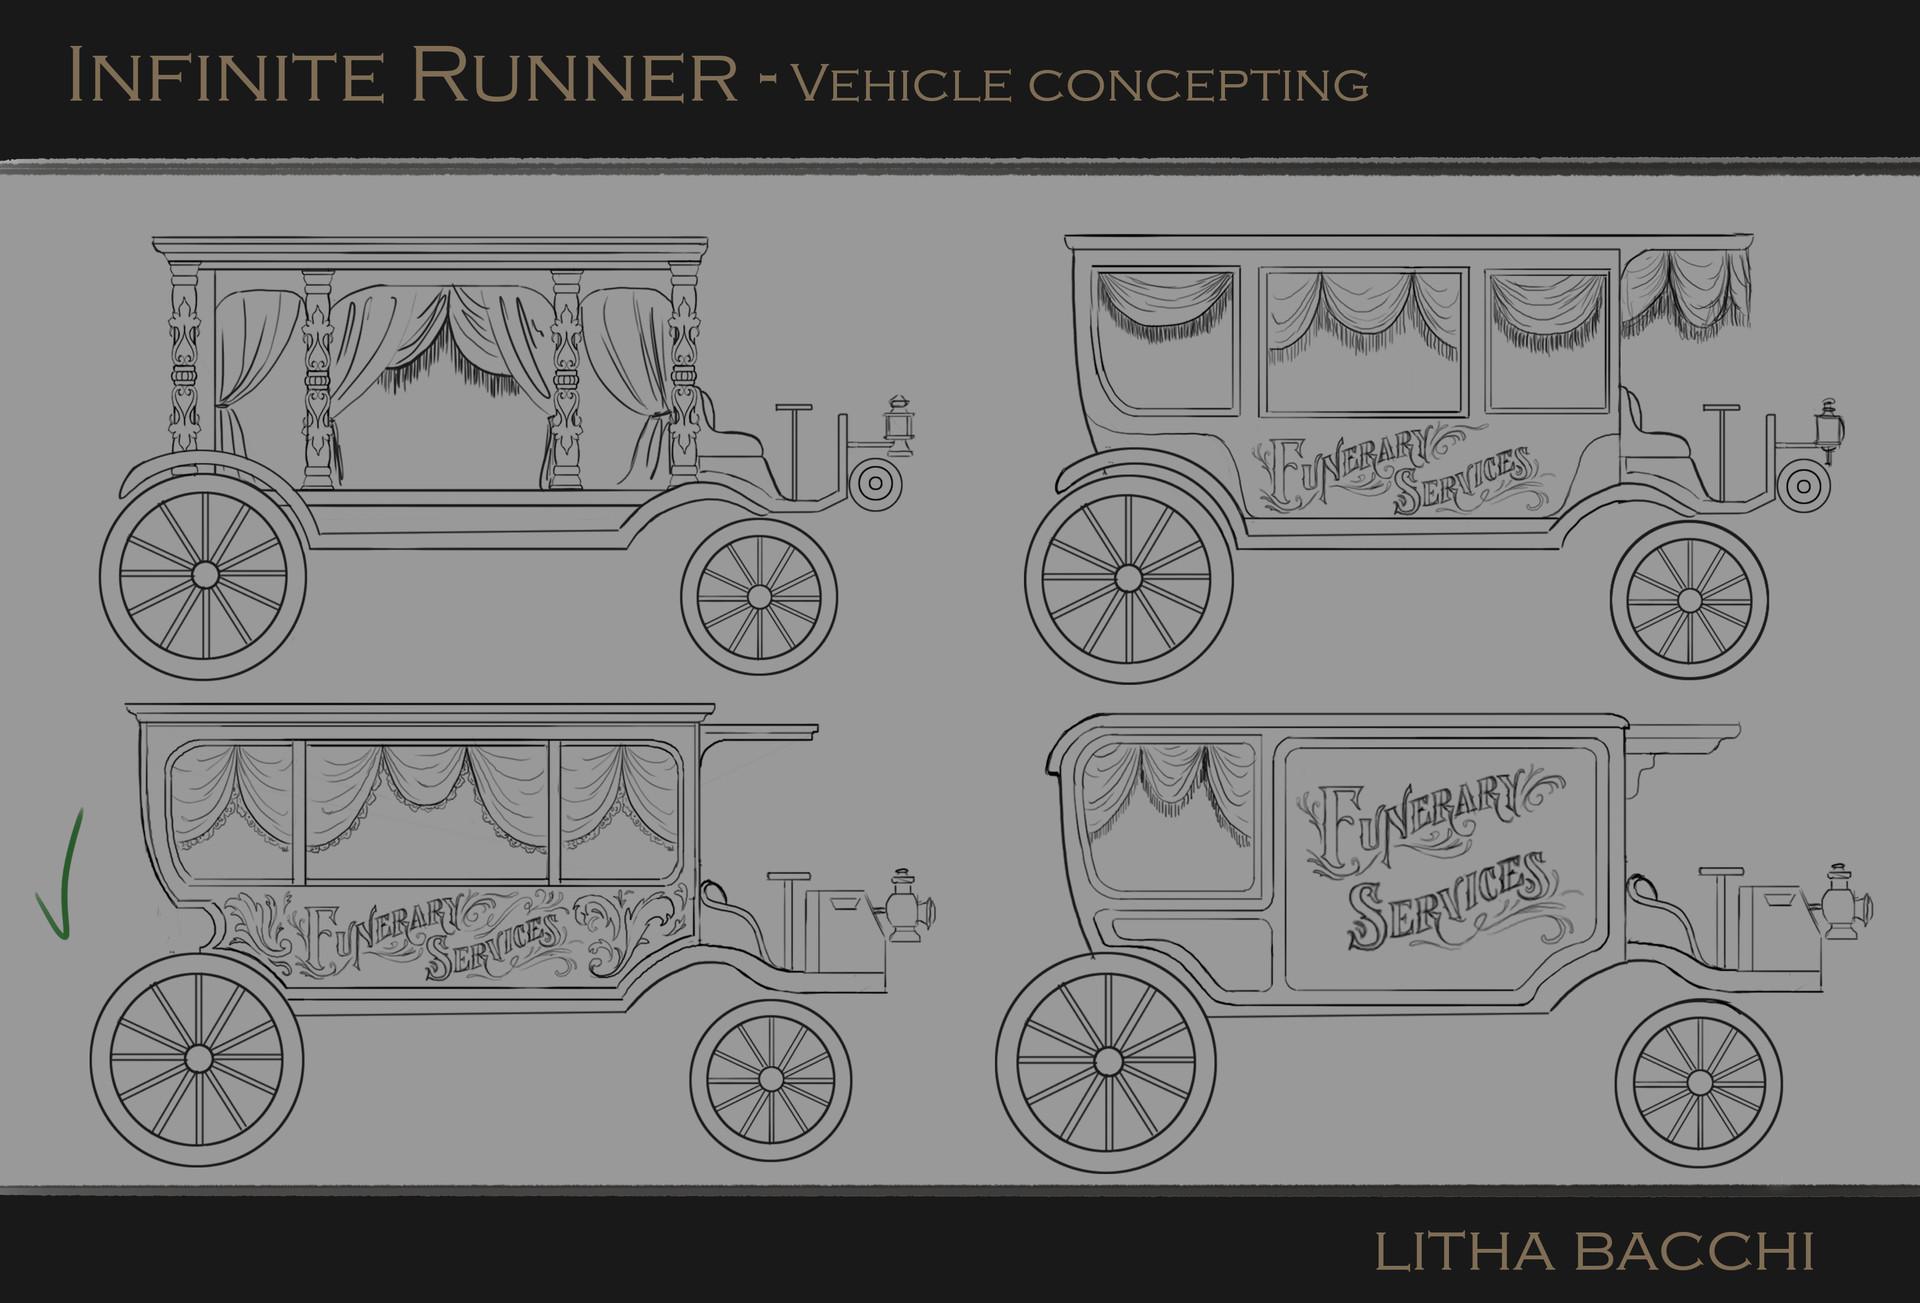 Litha bacchi vehicle concept 01